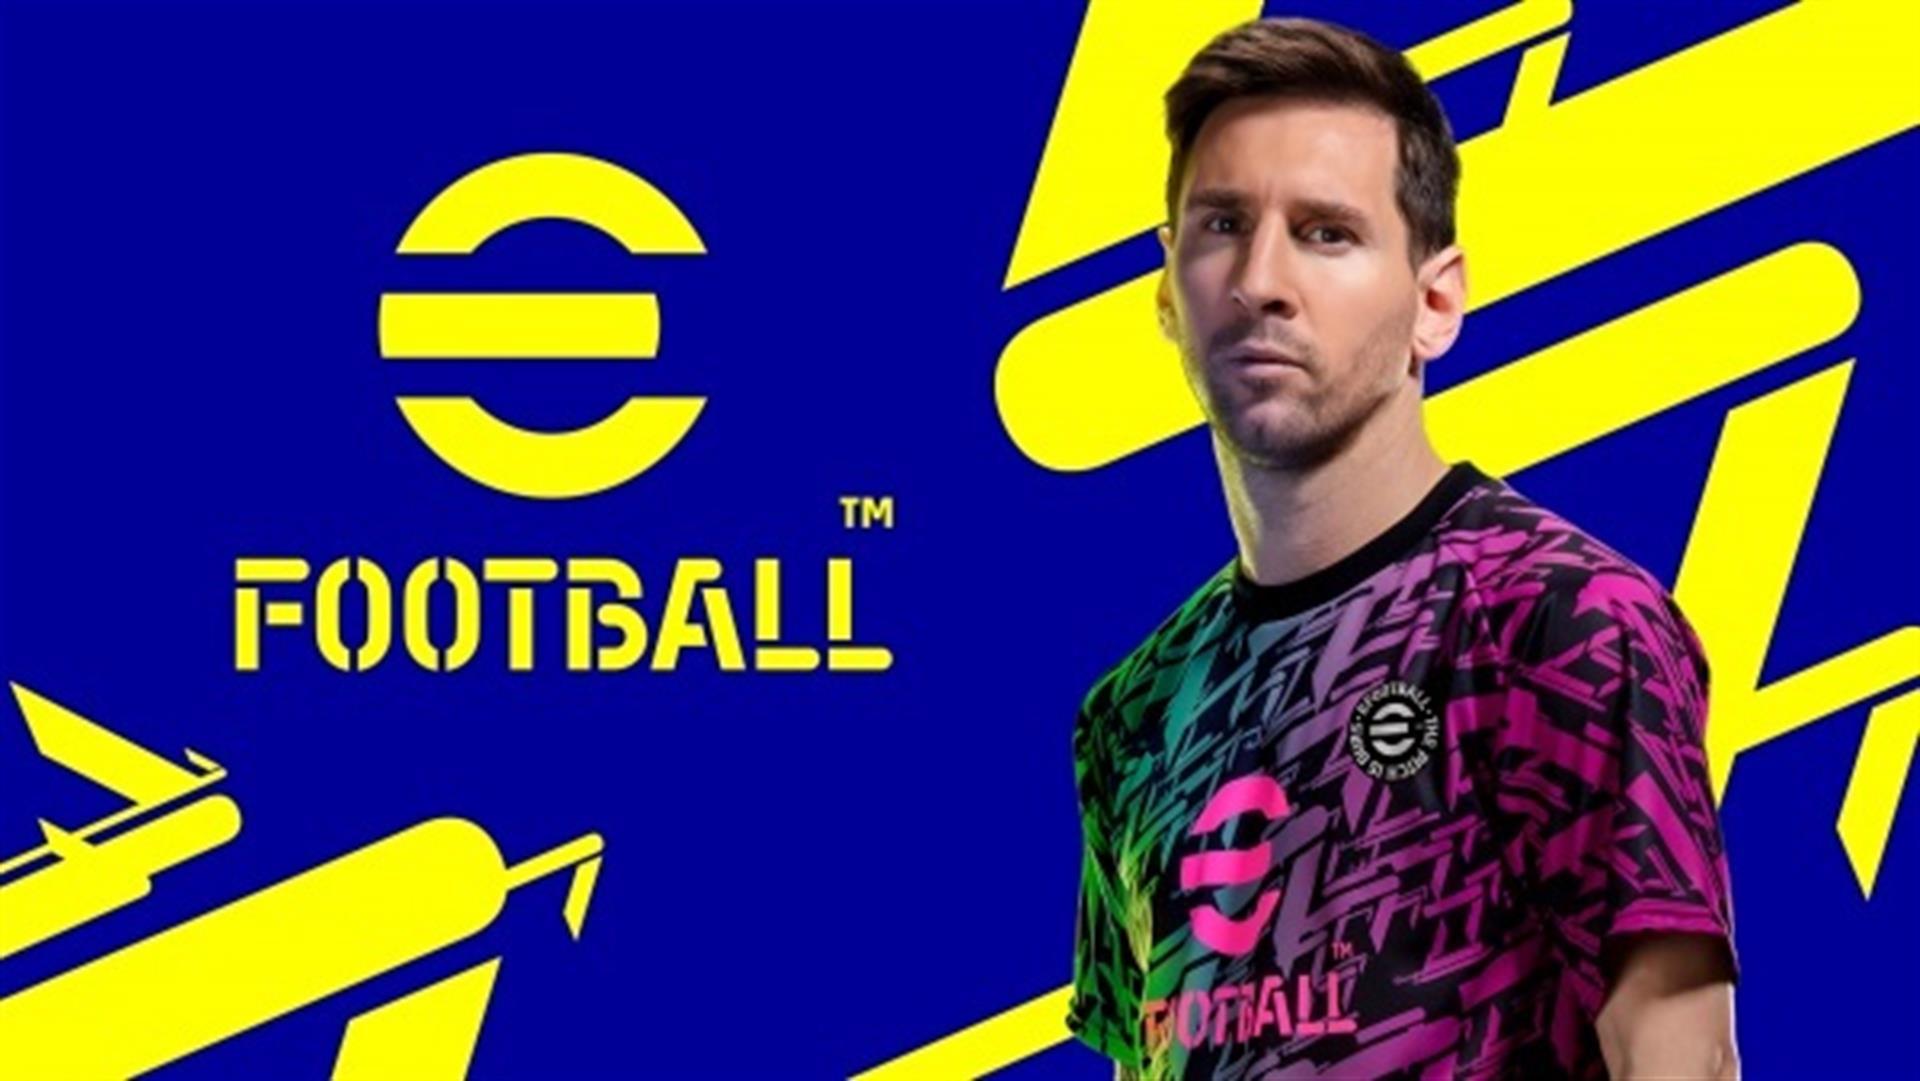 Presentación de eFootball. EFE